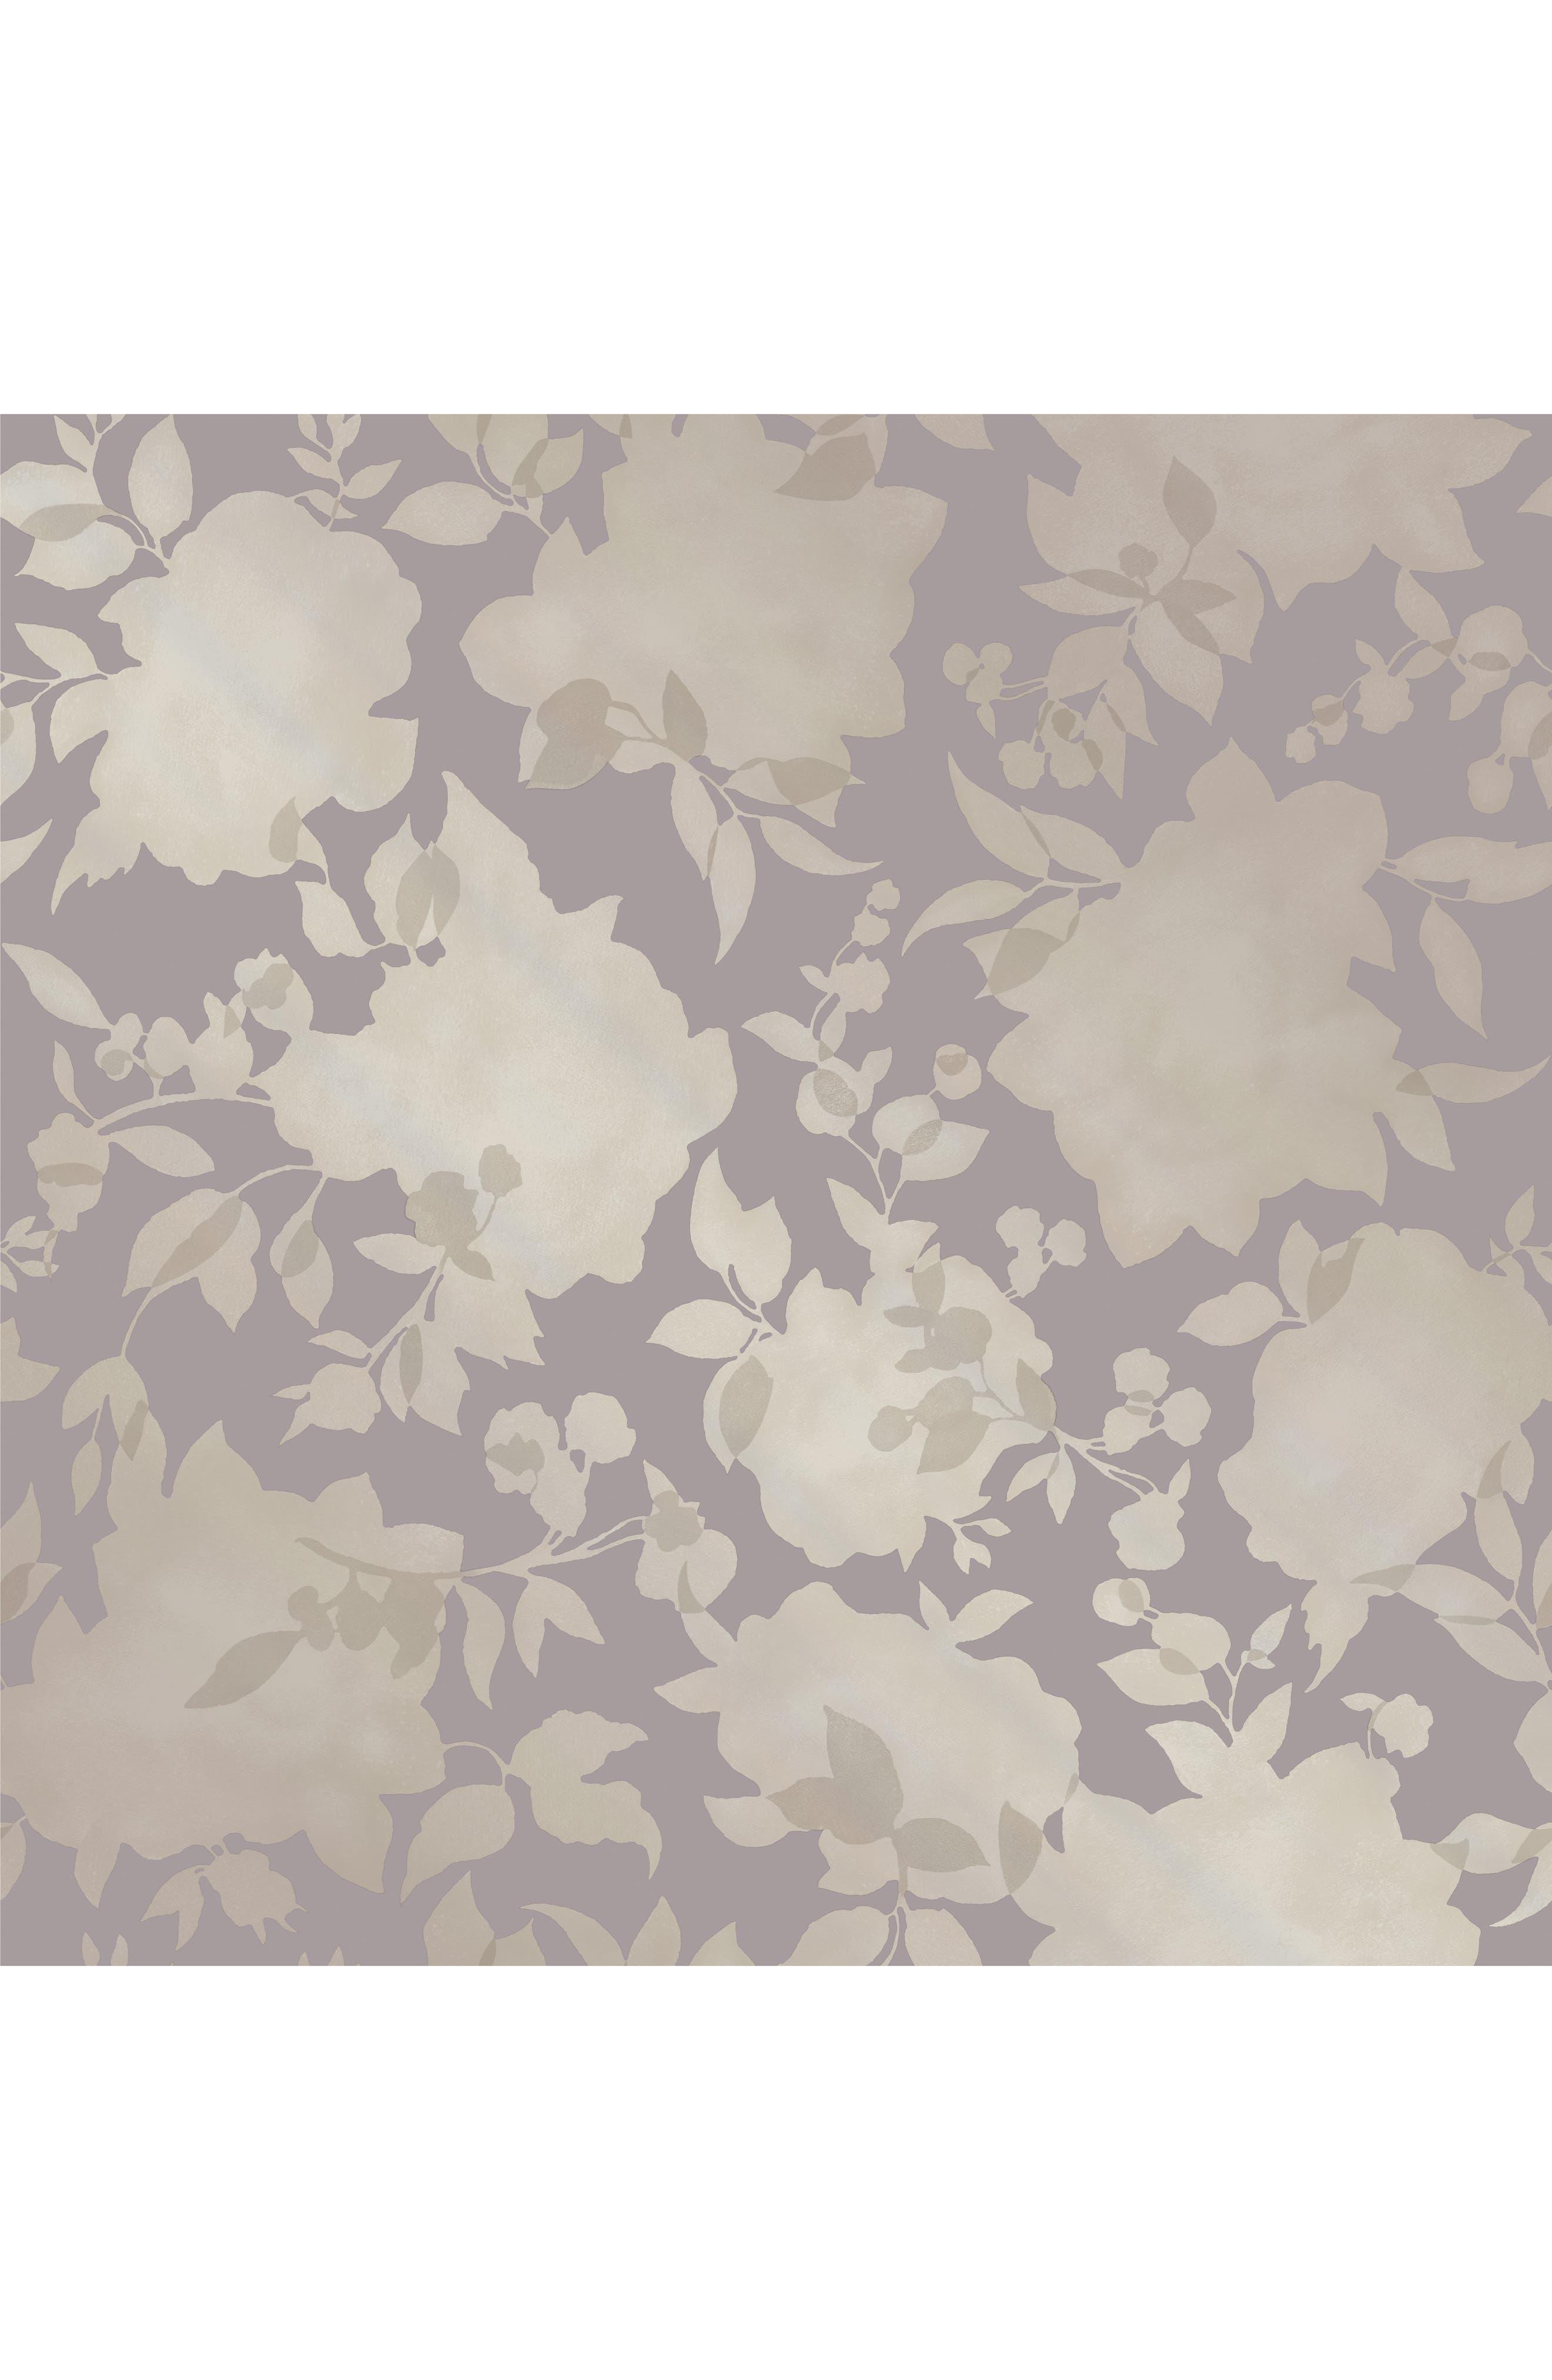 Silhouette Self-Adhesive Vinyl Wallpaper,                             Main thumbnail 3, color,